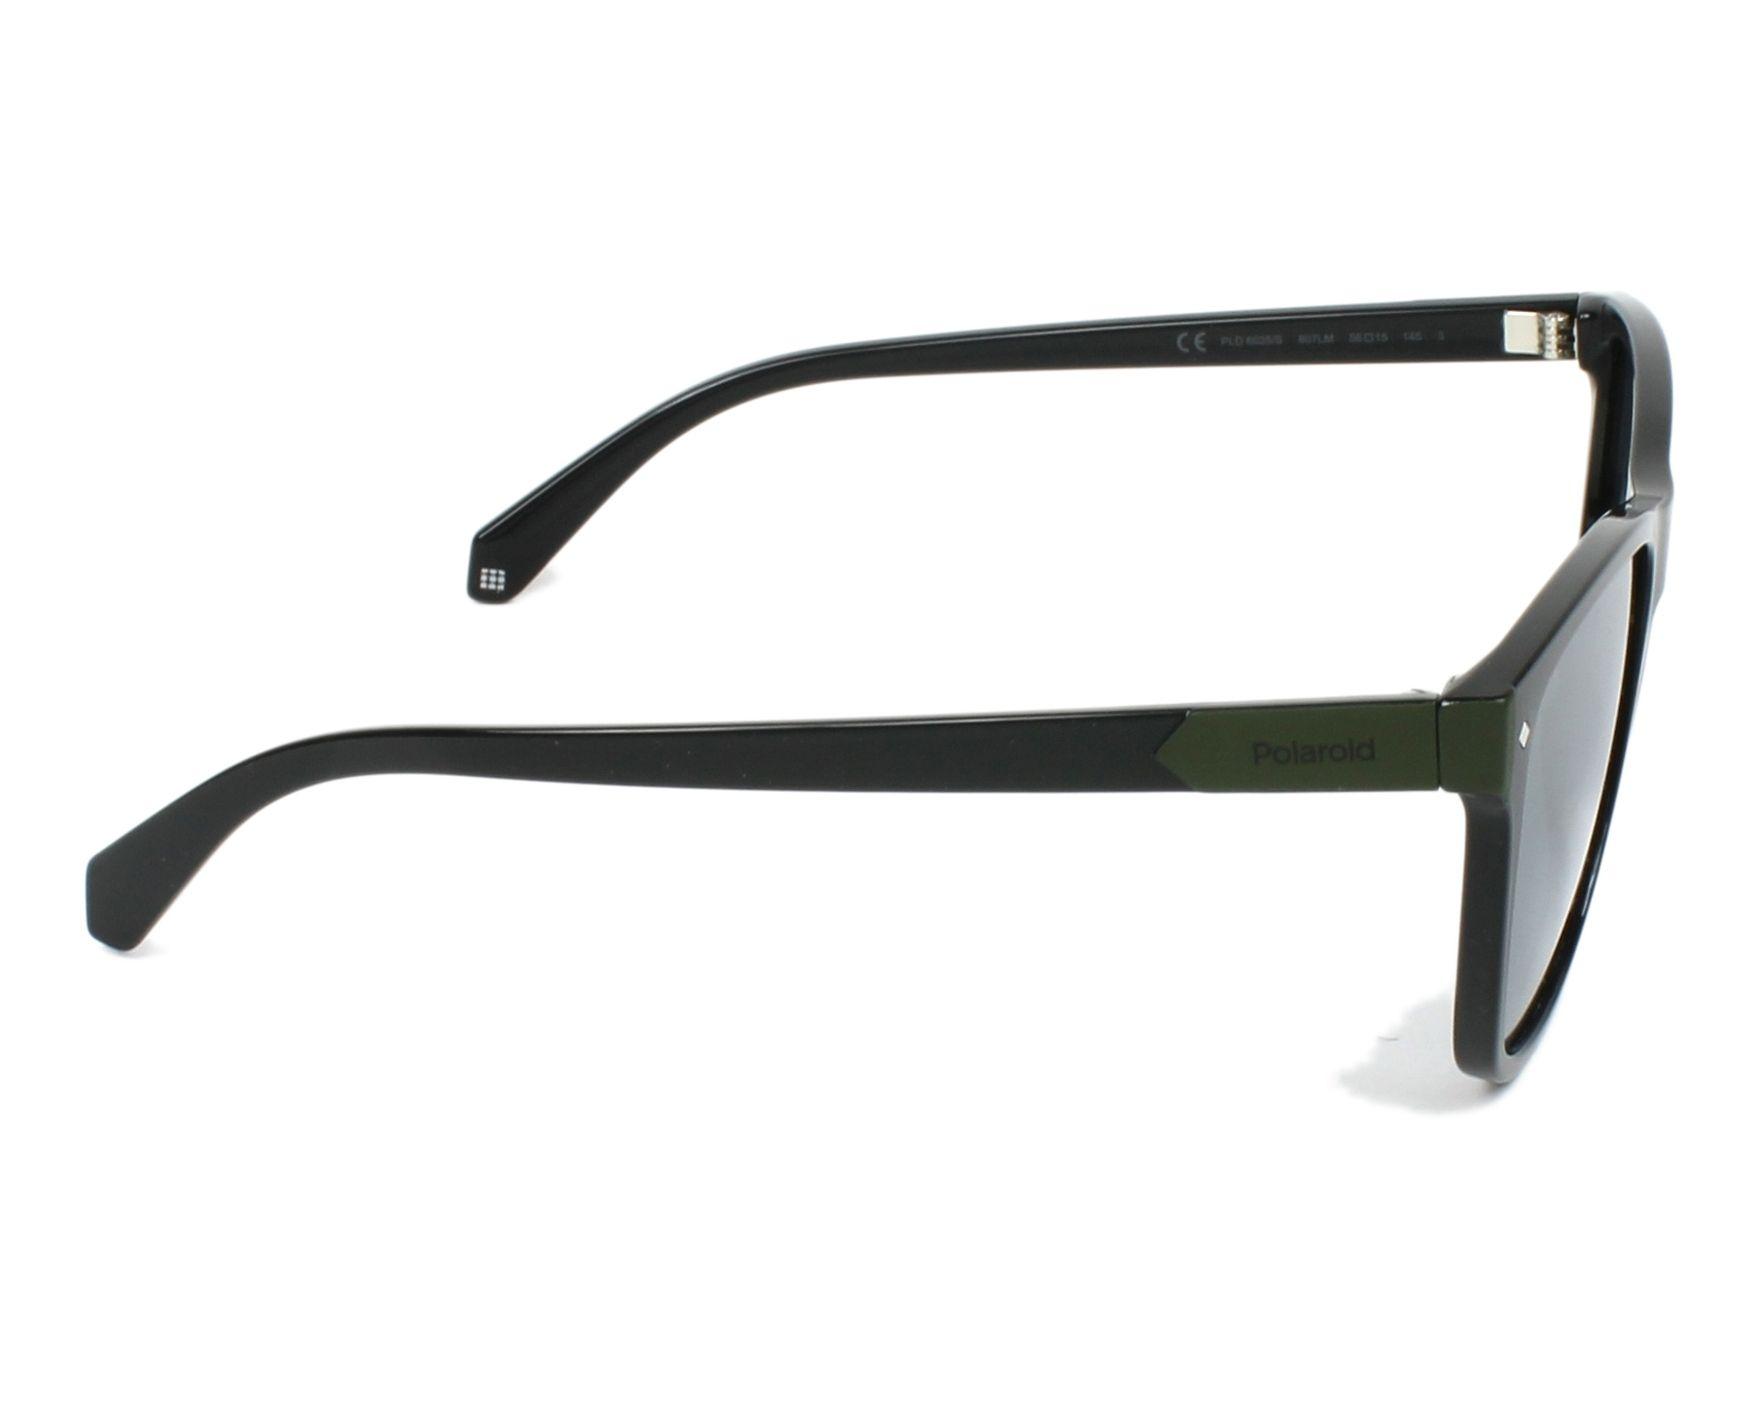 Sunglasses Polaroid PLD-6035-S 807 LM 56-15 Black Green side 9749f489662